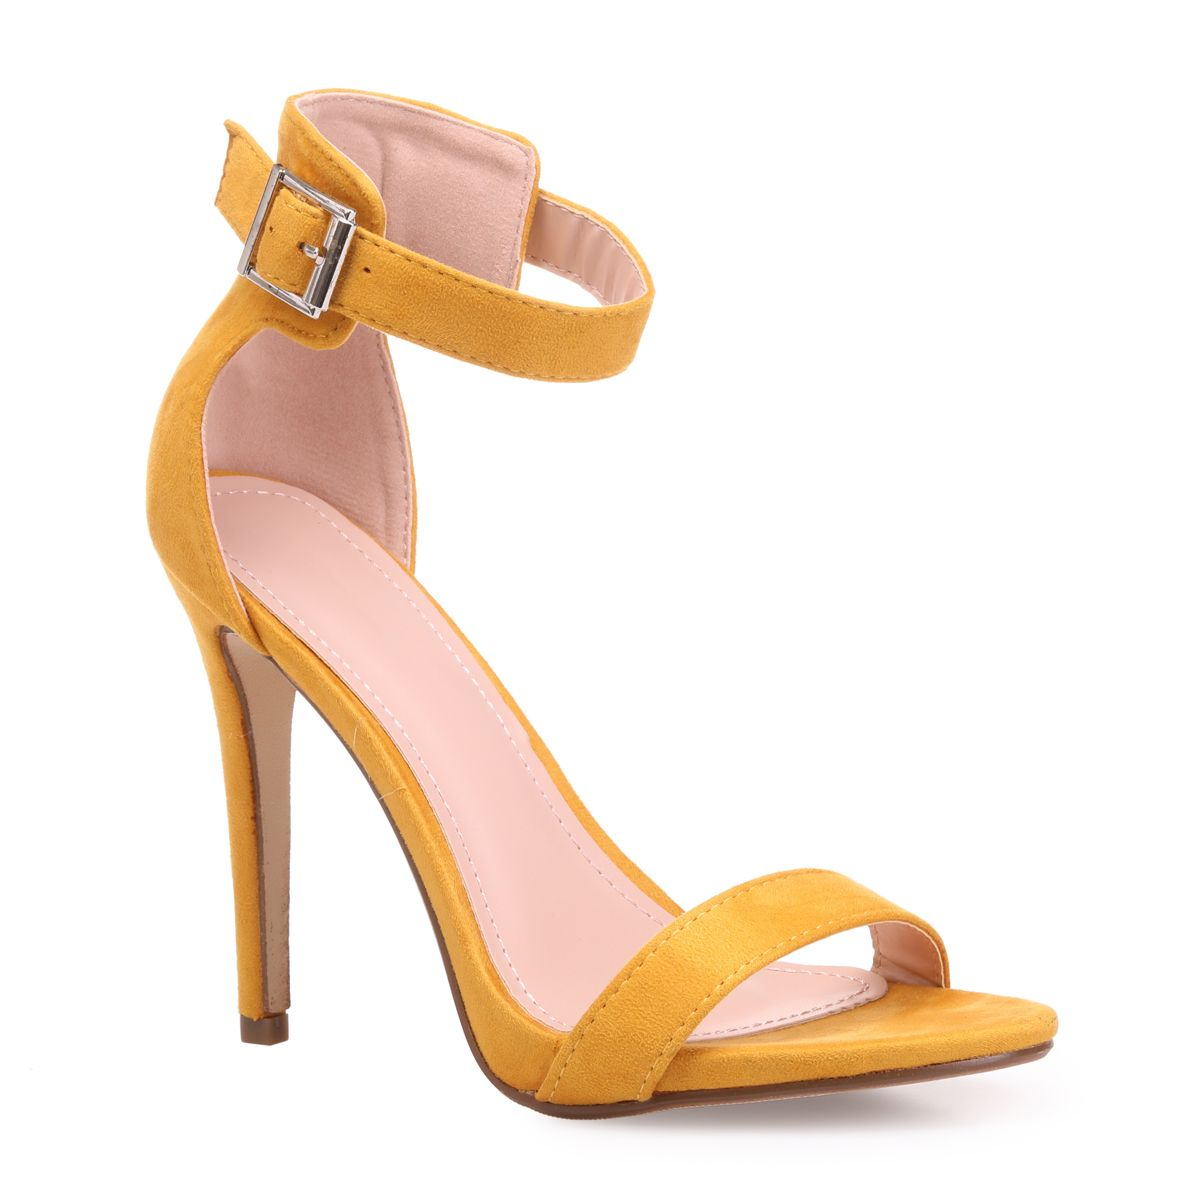 Sandale talon femme jaune